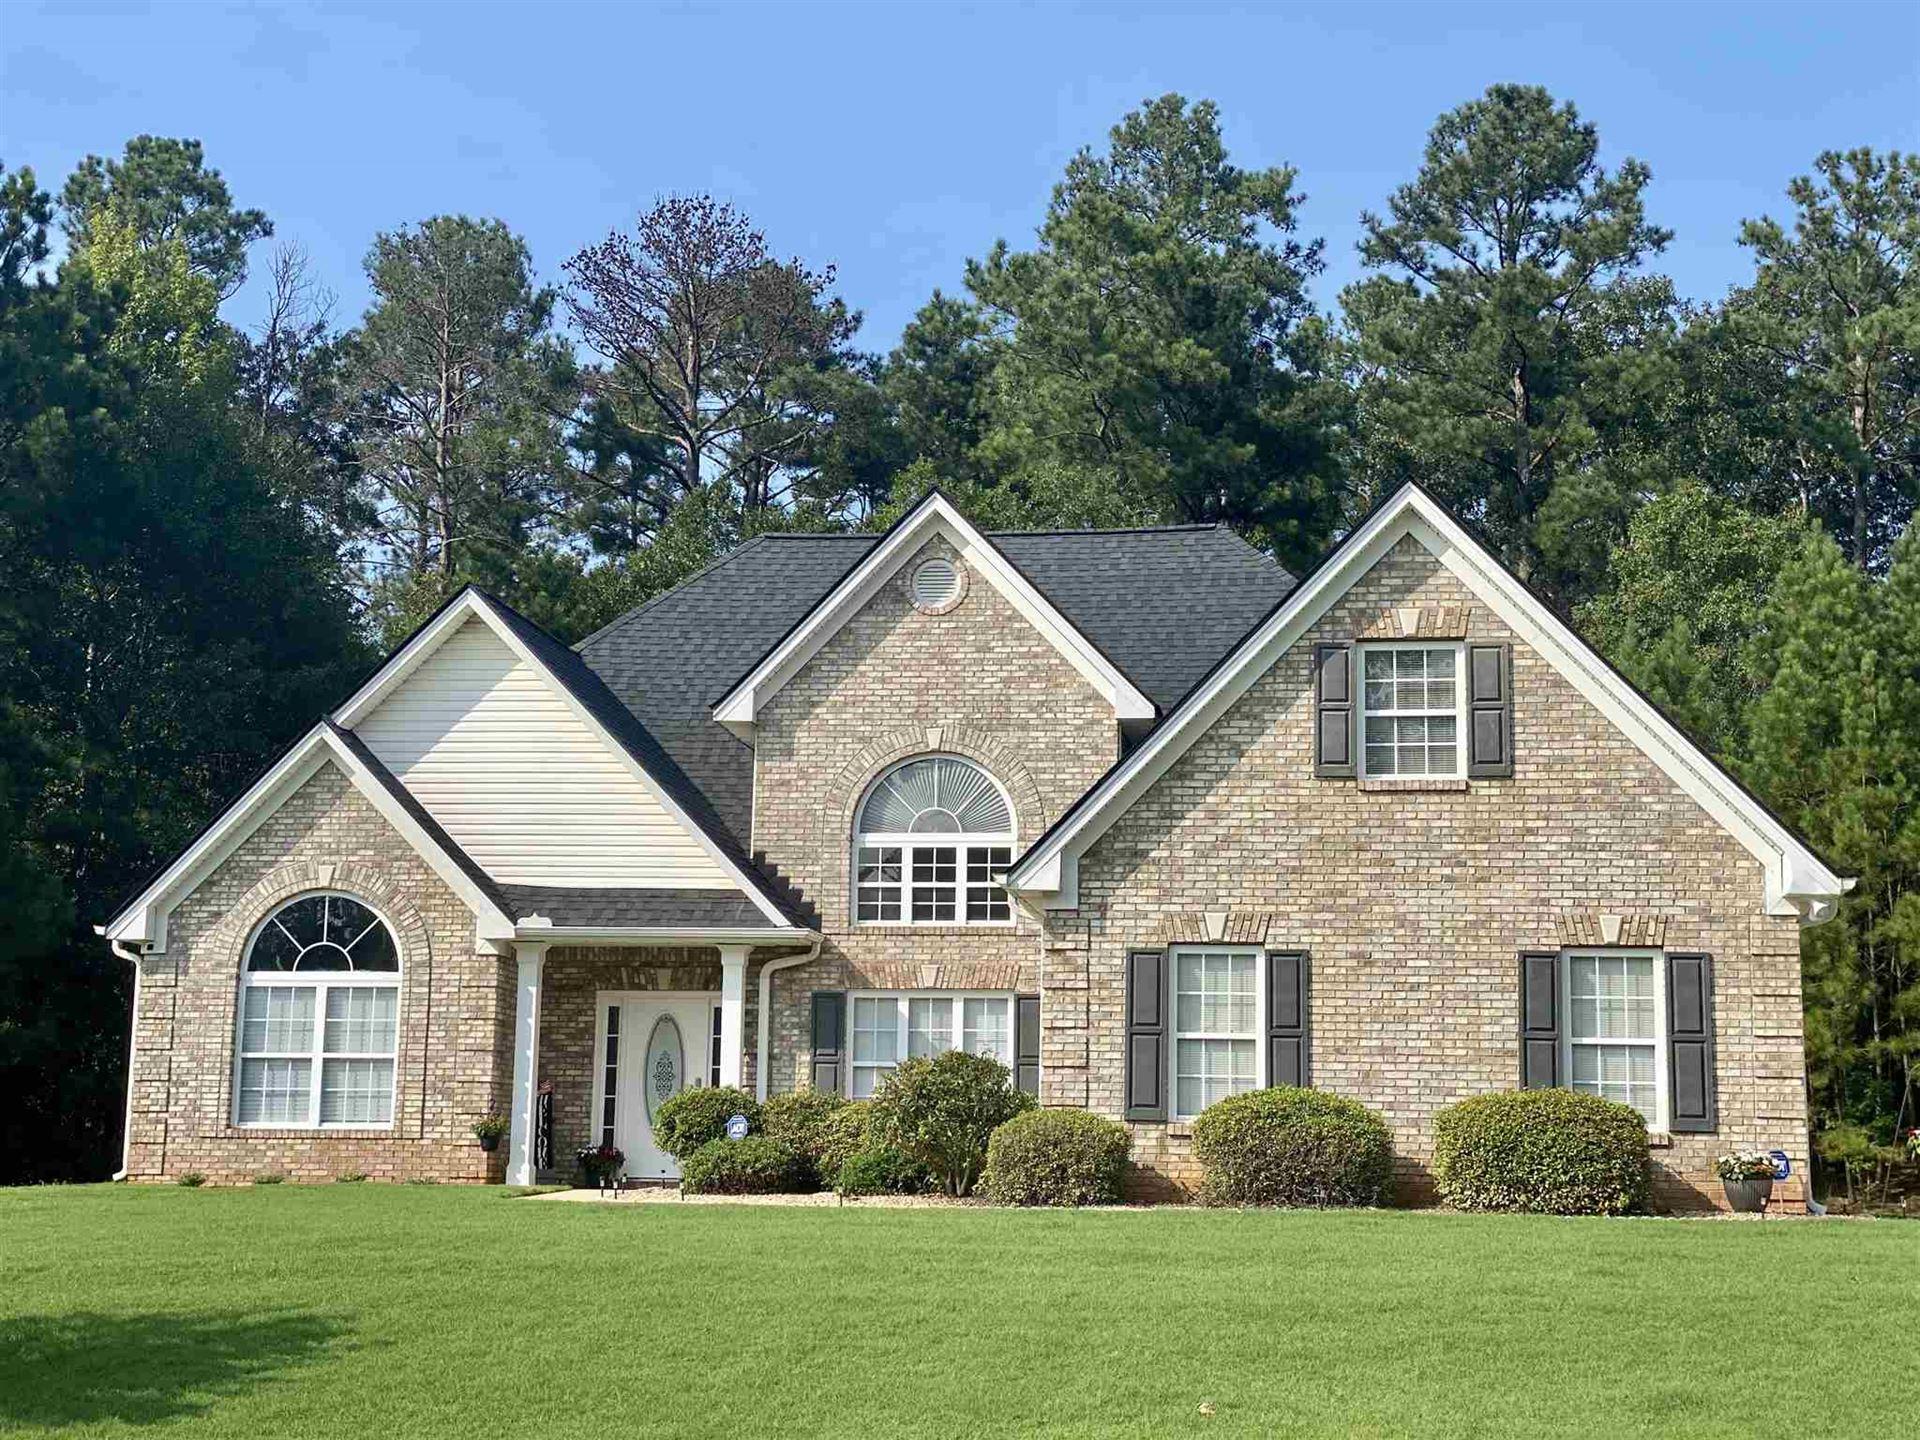 1437 Cotton Trl, Conyers, GA 30094 - MLS#: 8853829